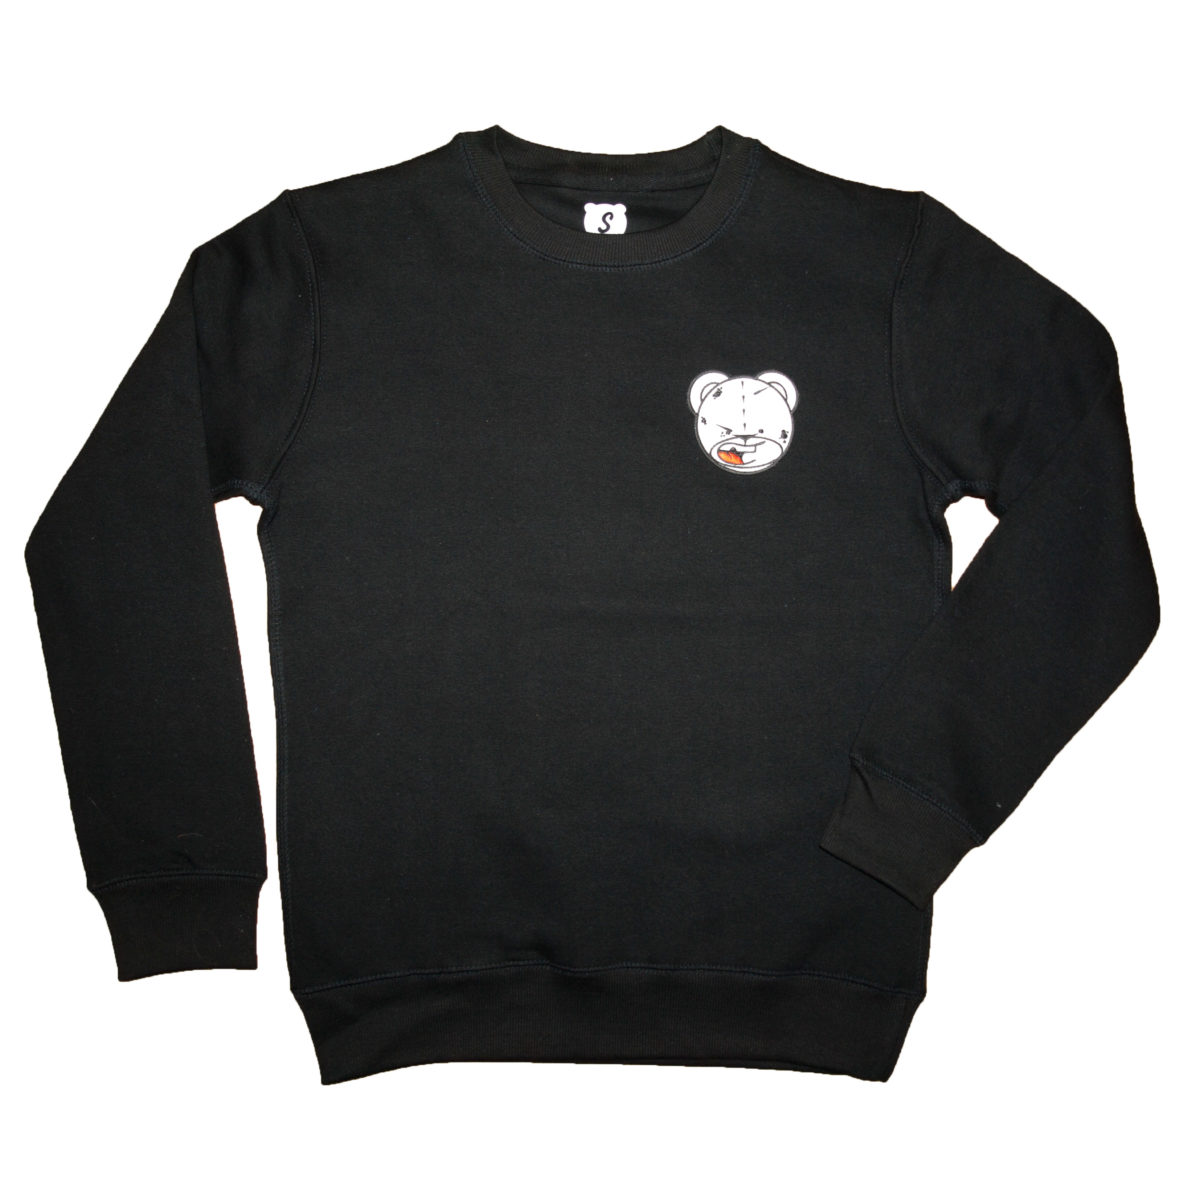 endzlab - bad ass sweatshirt